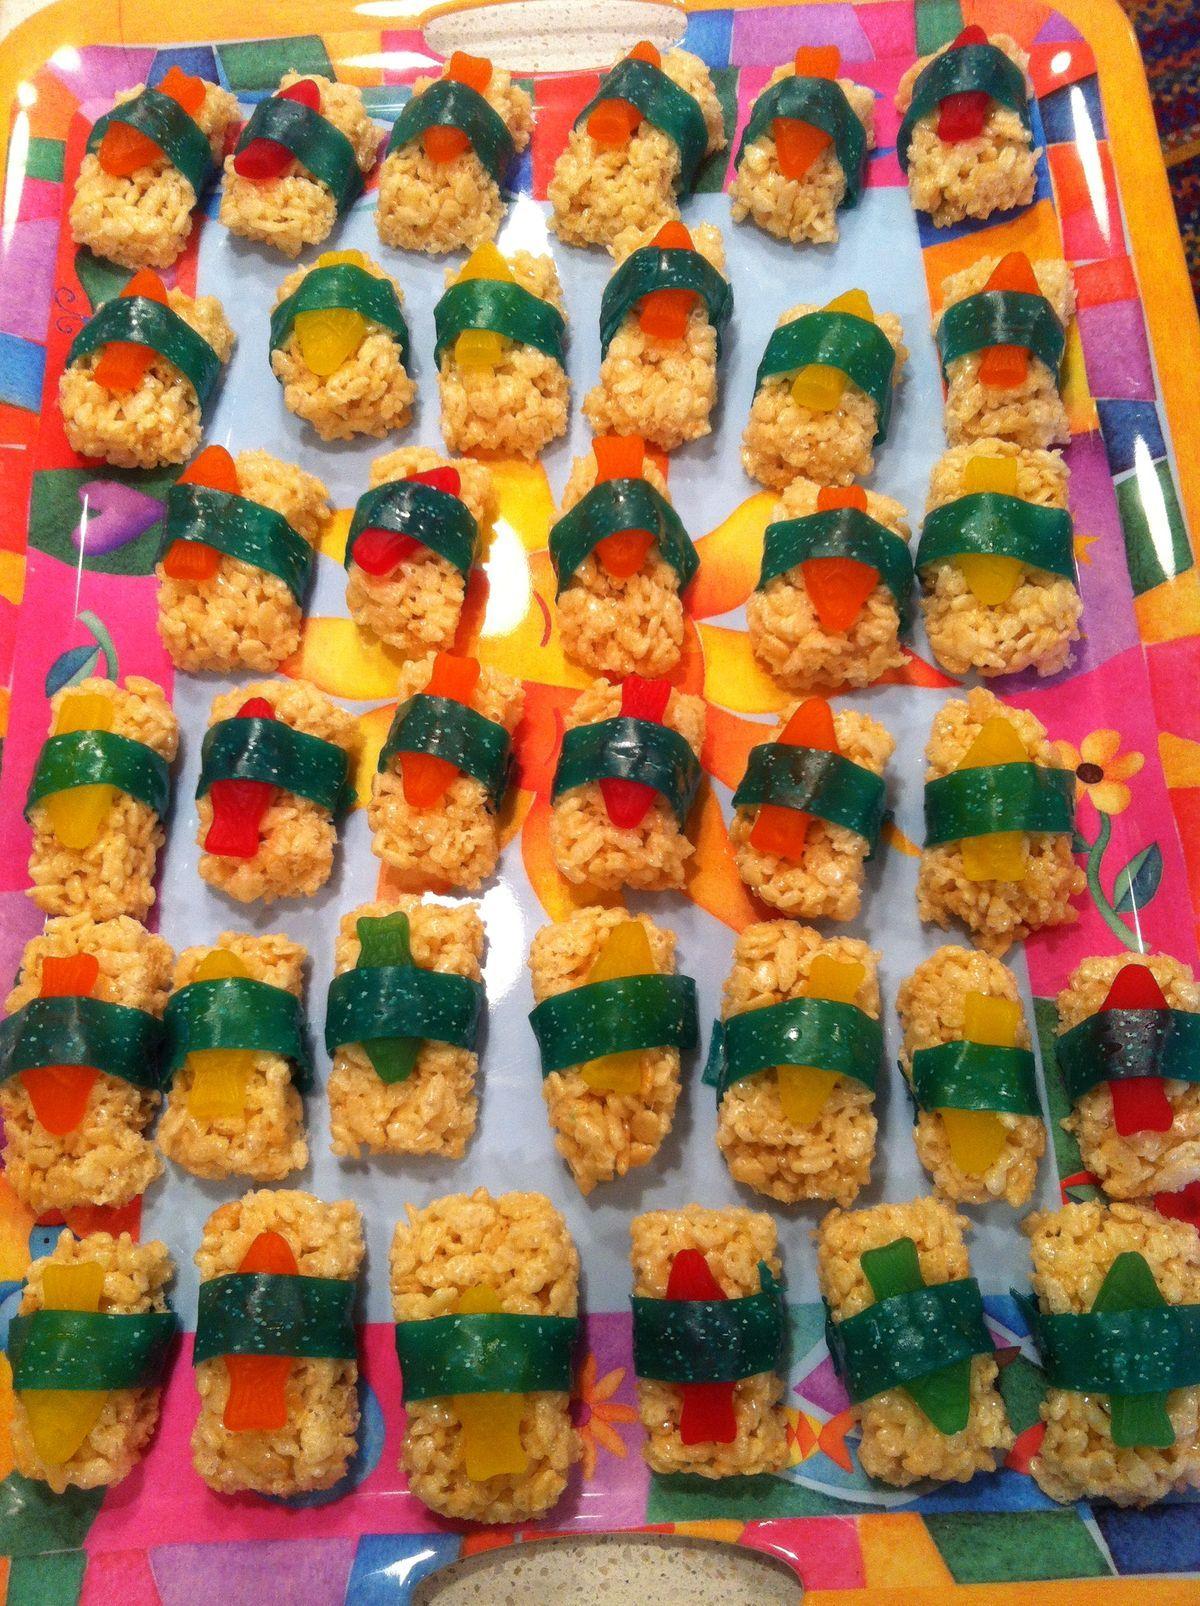 Candy Sushi Krispy treats, Swedish fish, & fruit by the